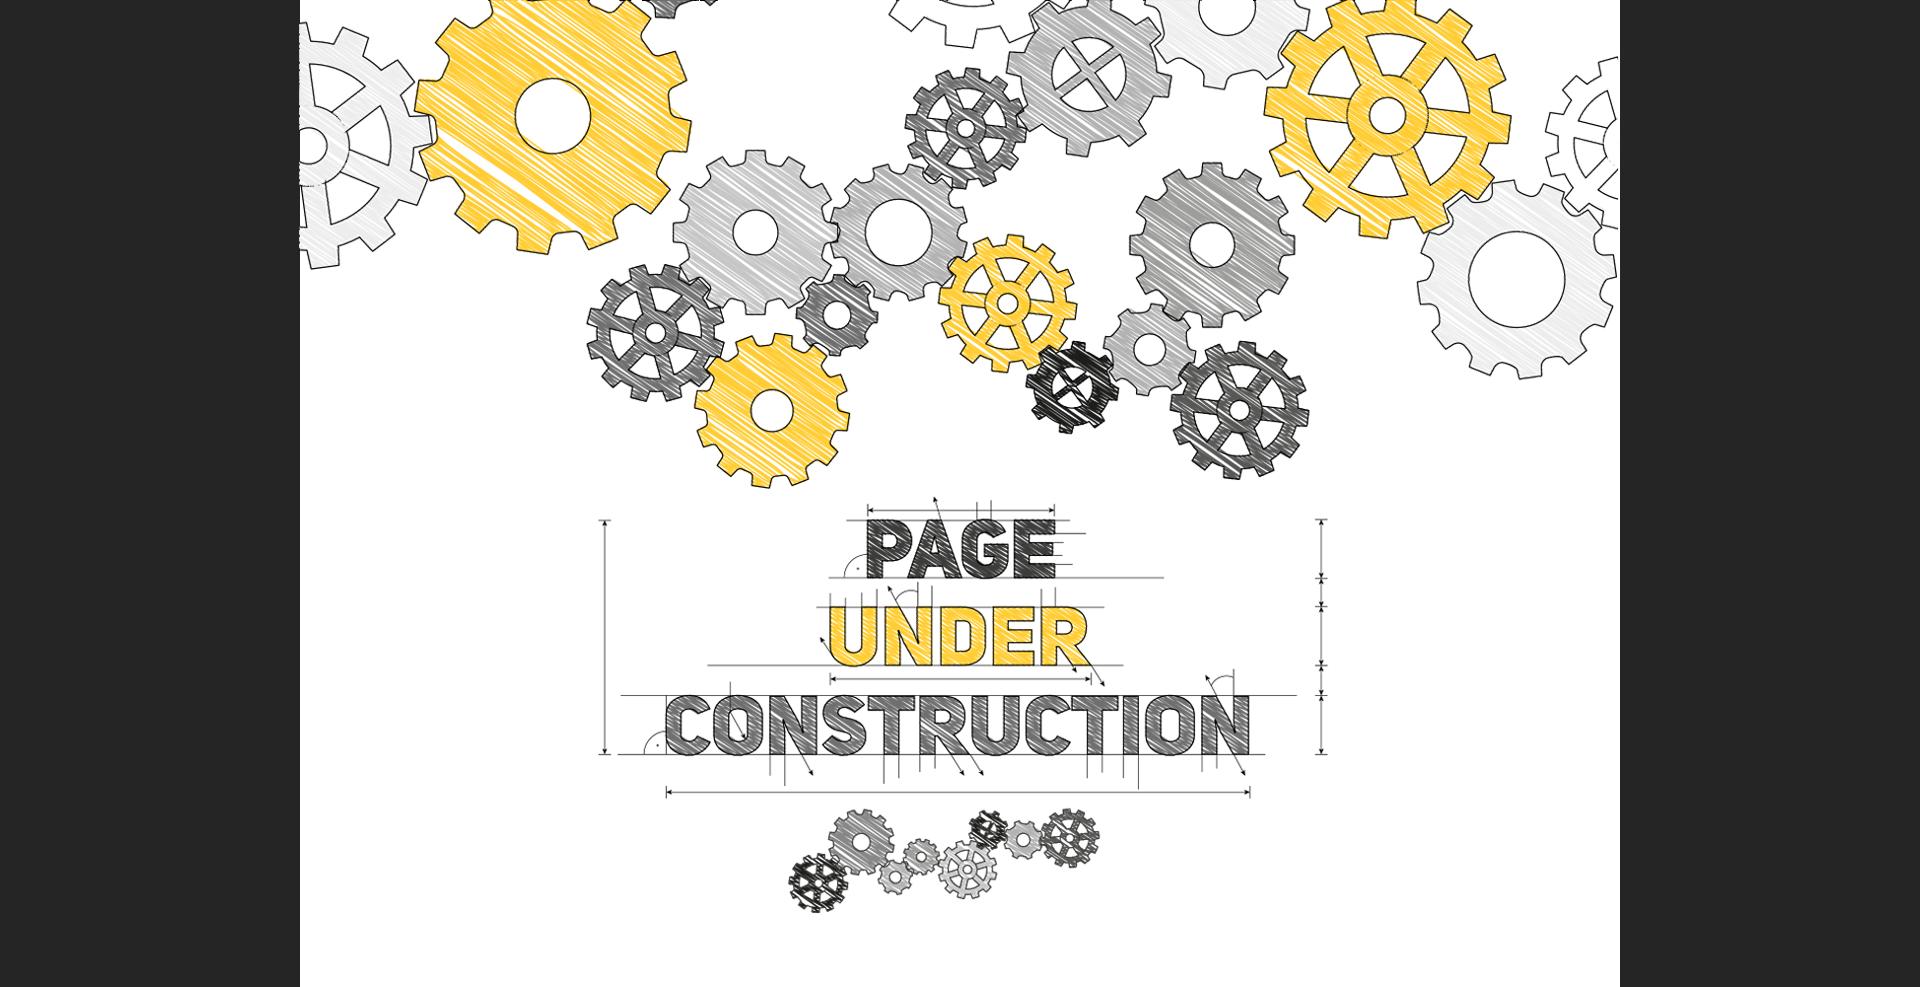 The SEO Implications Of Major Web Design & Development Decisions